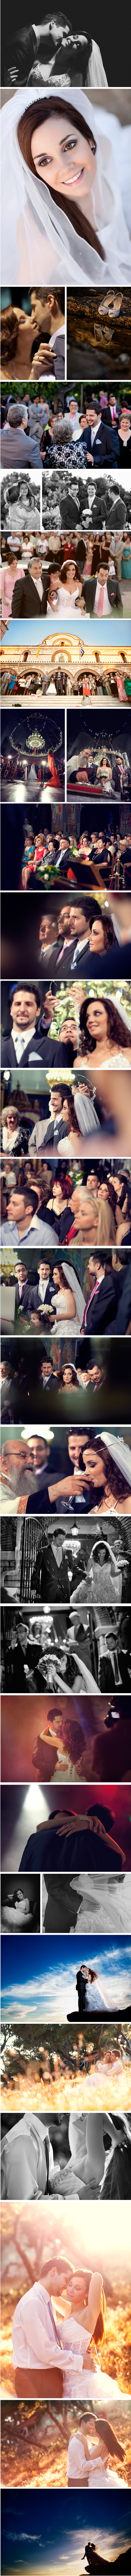 Blog Collage-Ματινα&Αντρεας